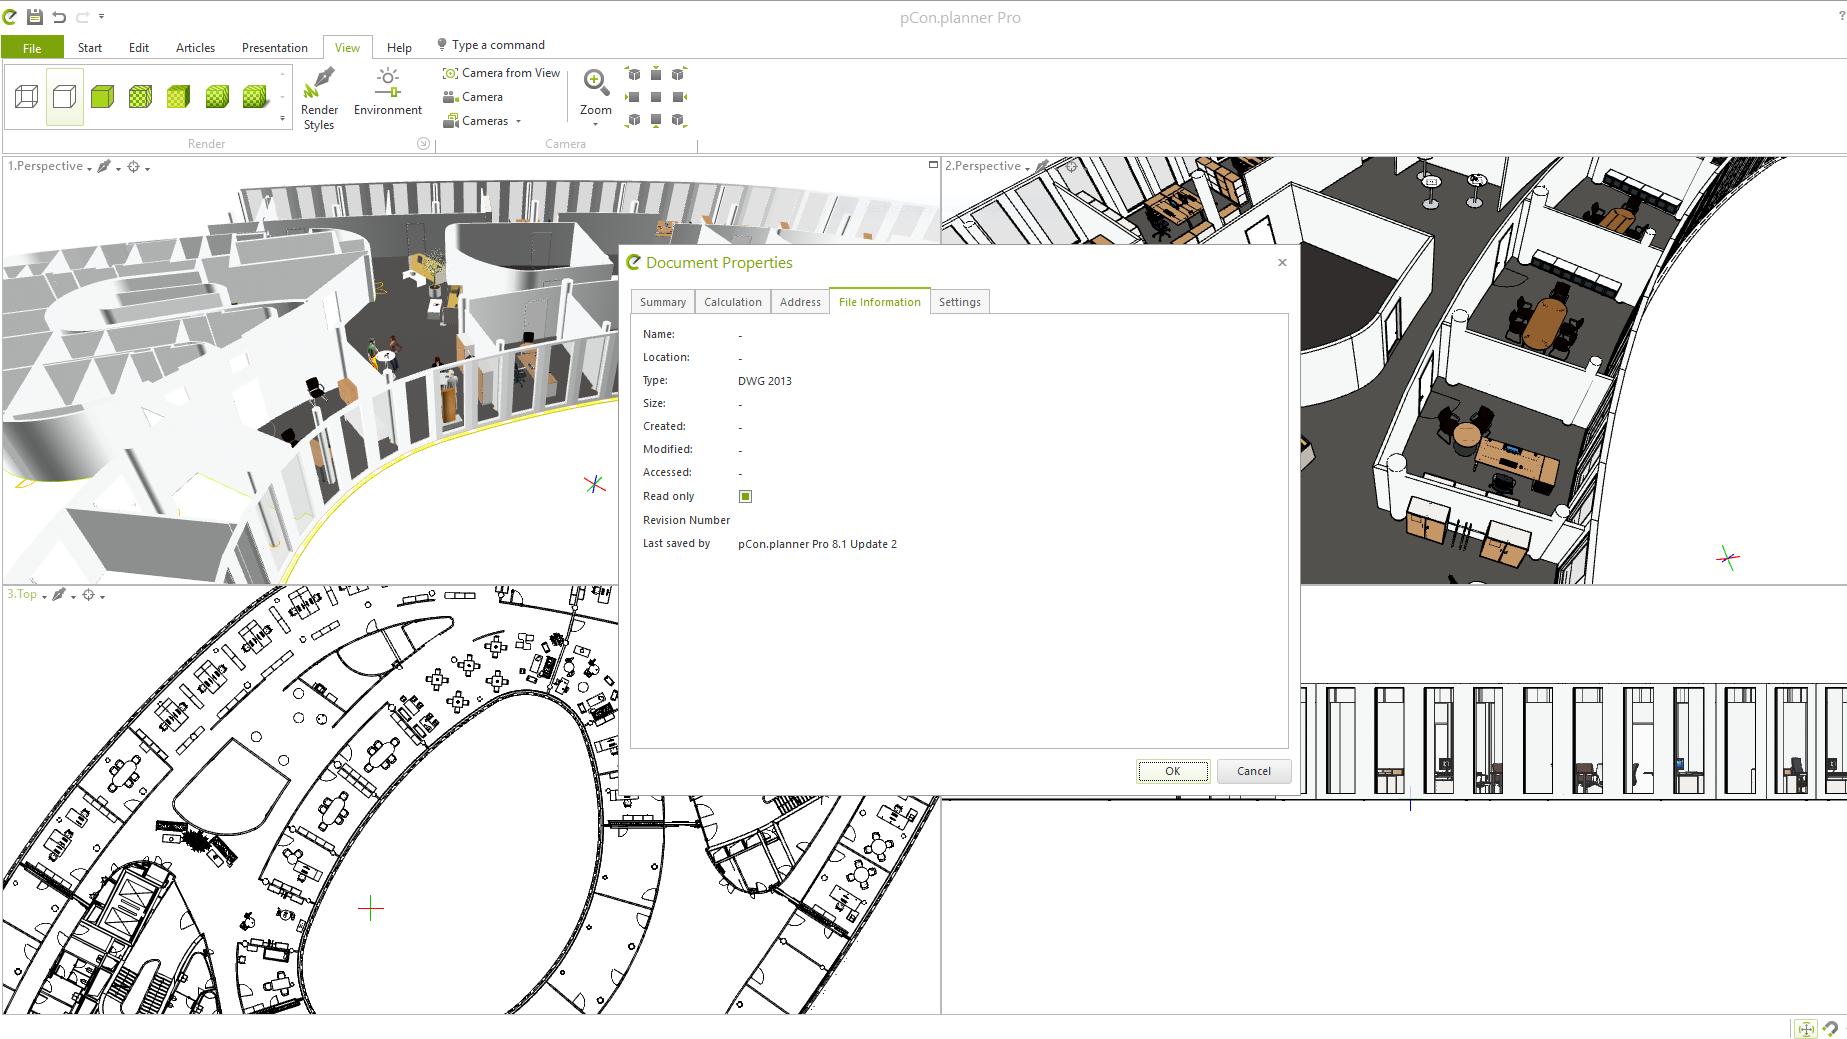 pCon.planner: instrument gratuit de conversie pentru date 3D